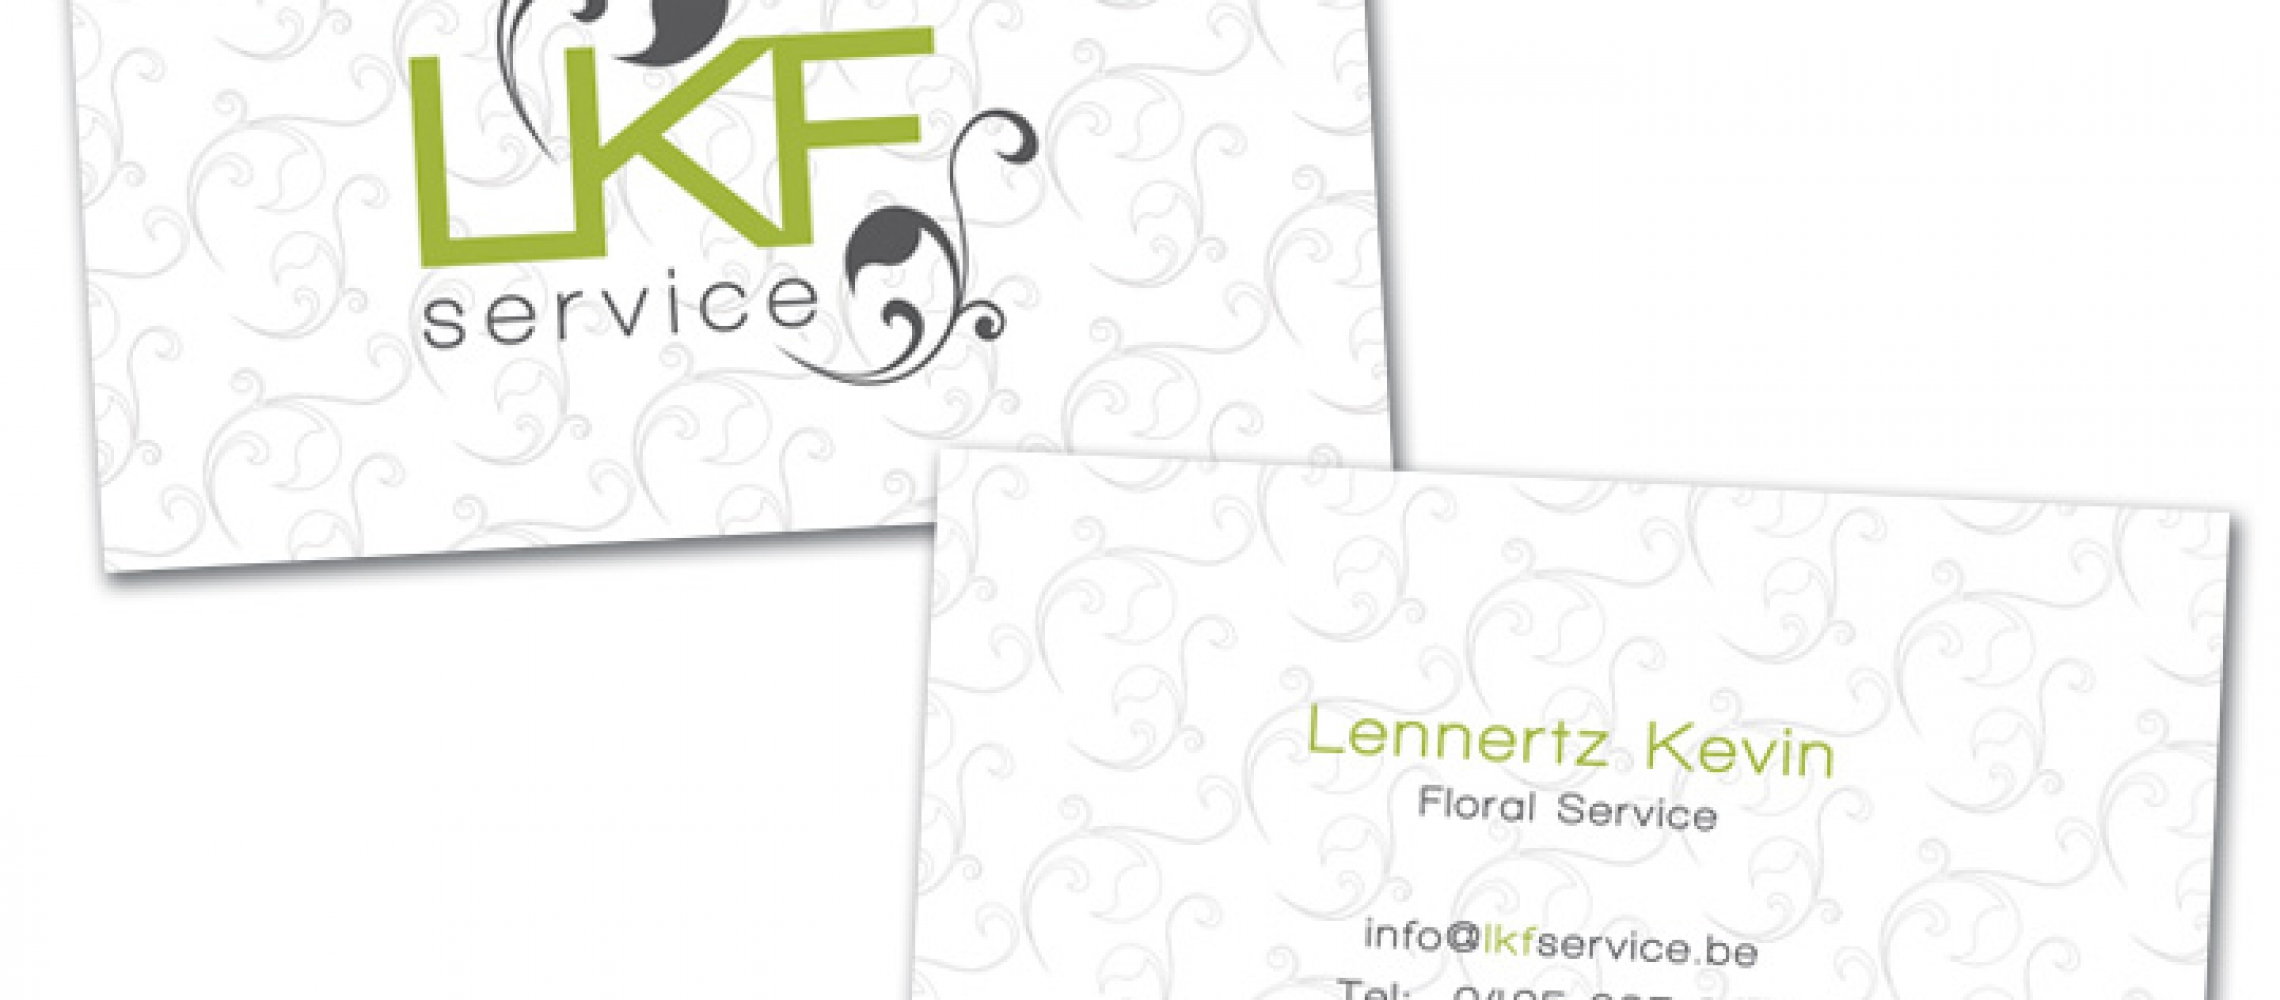 LKF service naamkaartje